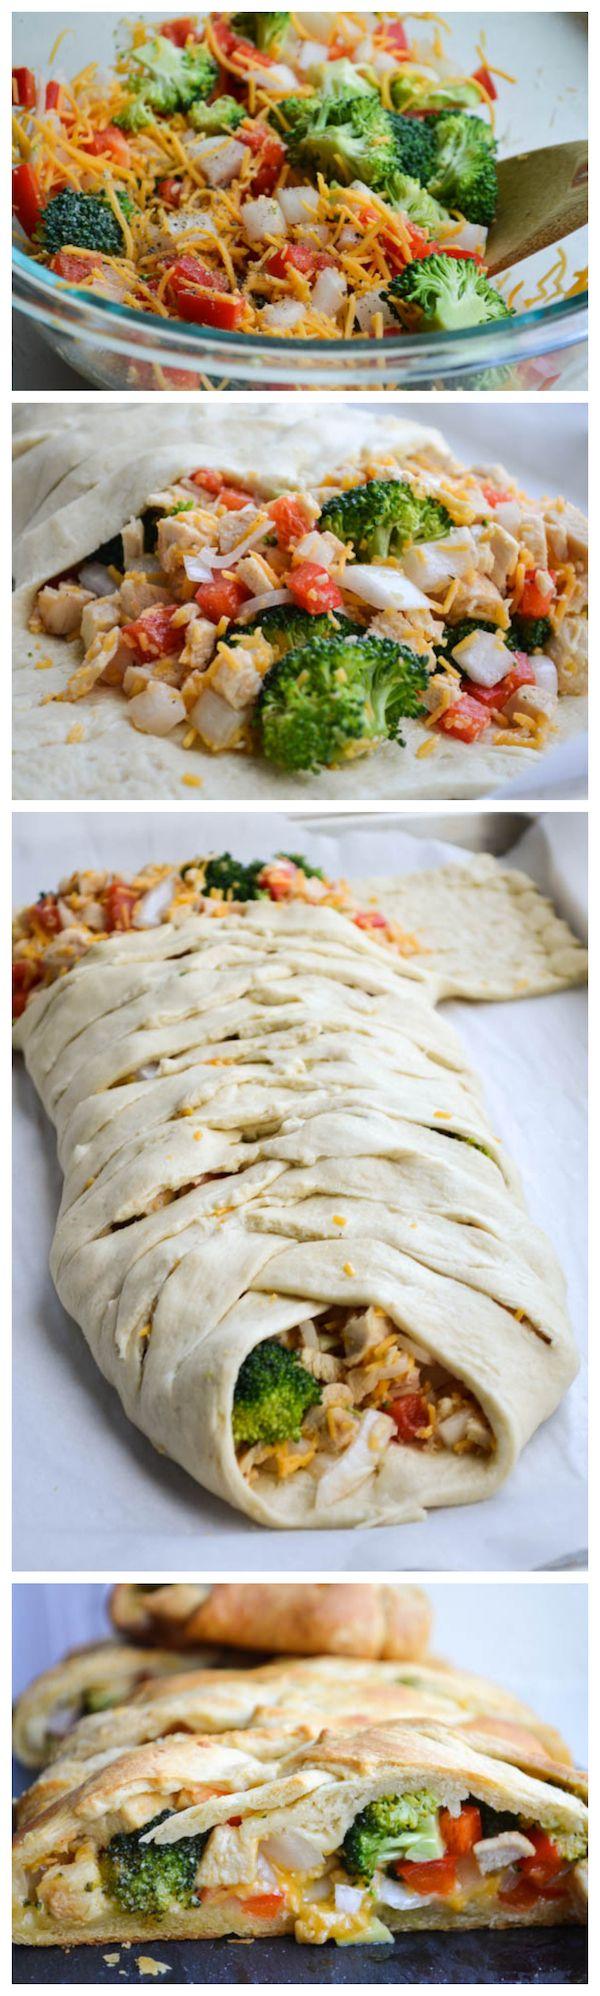 Broccoli & Chicken Braided Bread made from crescent rolls